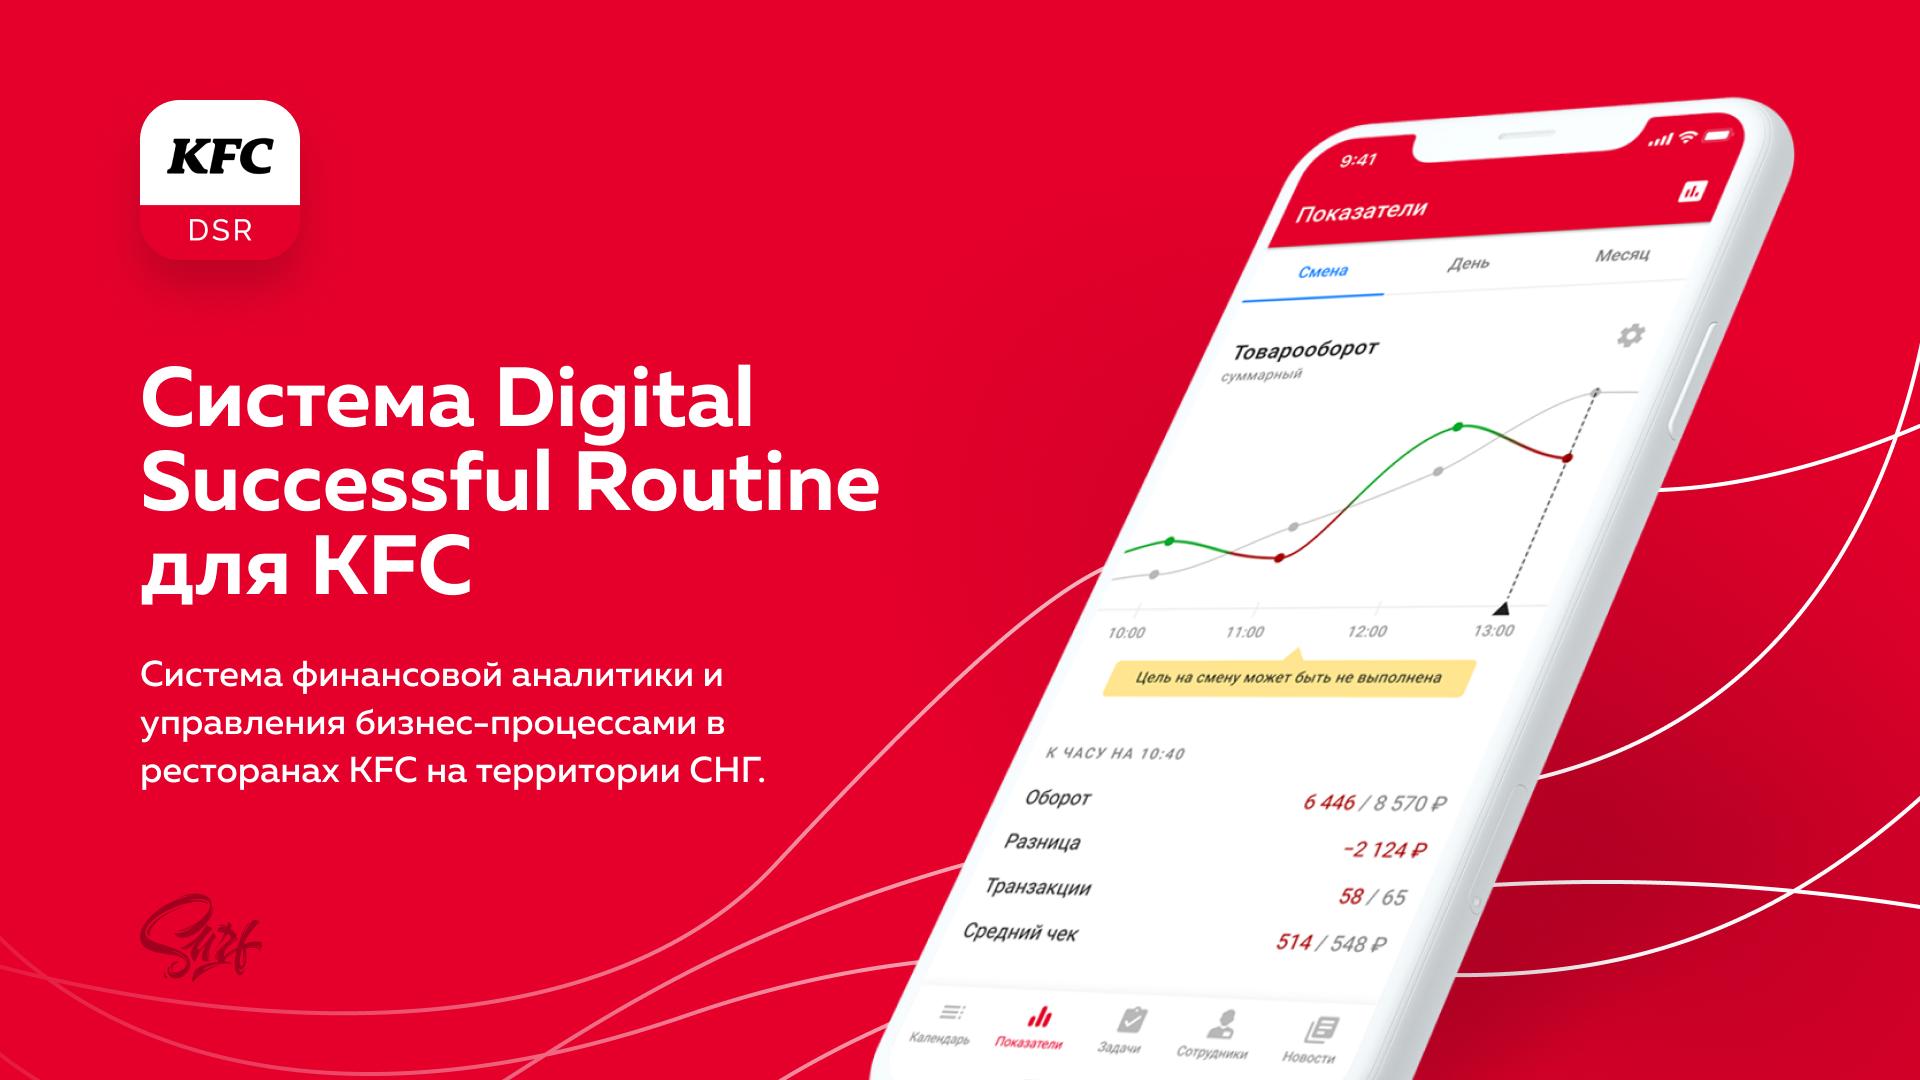 Система KFC DSR (Digital Successful Routine)